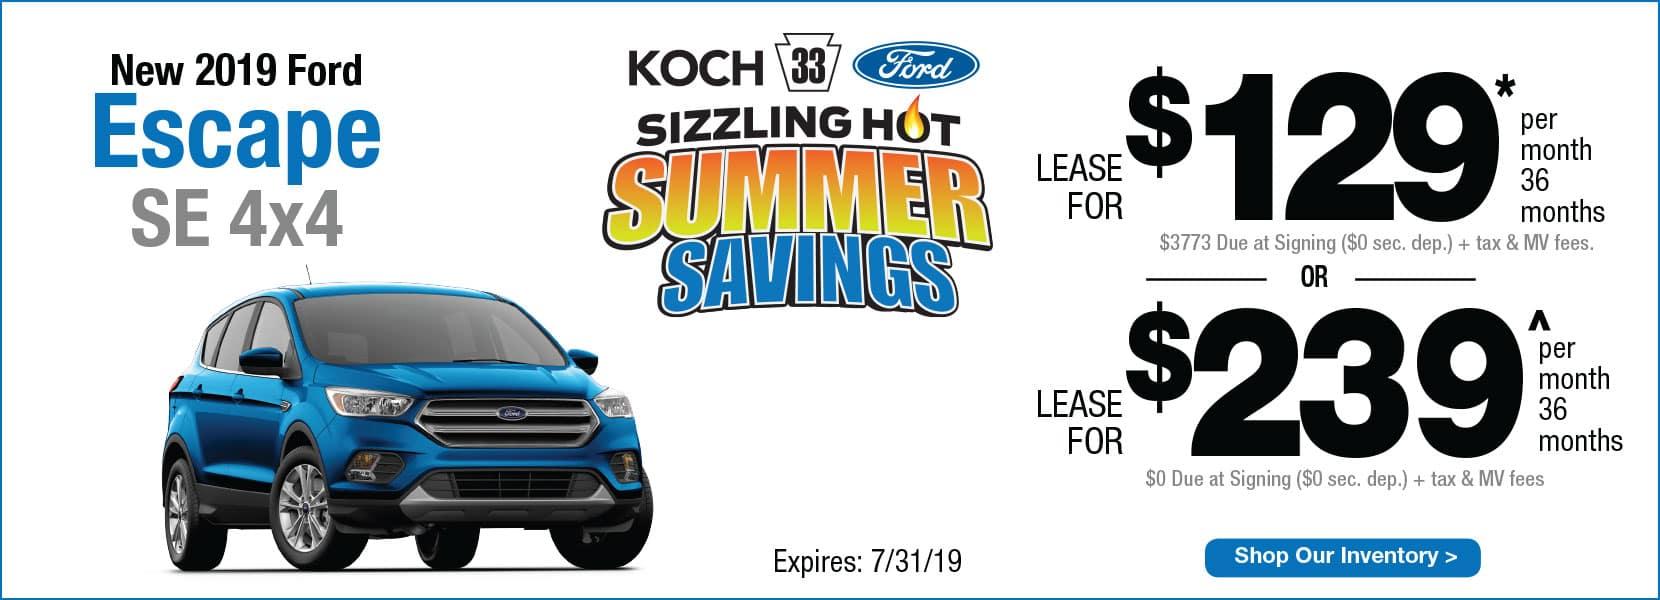 New 2019 Ford Escape SE 4x4 Koch 33 Ford